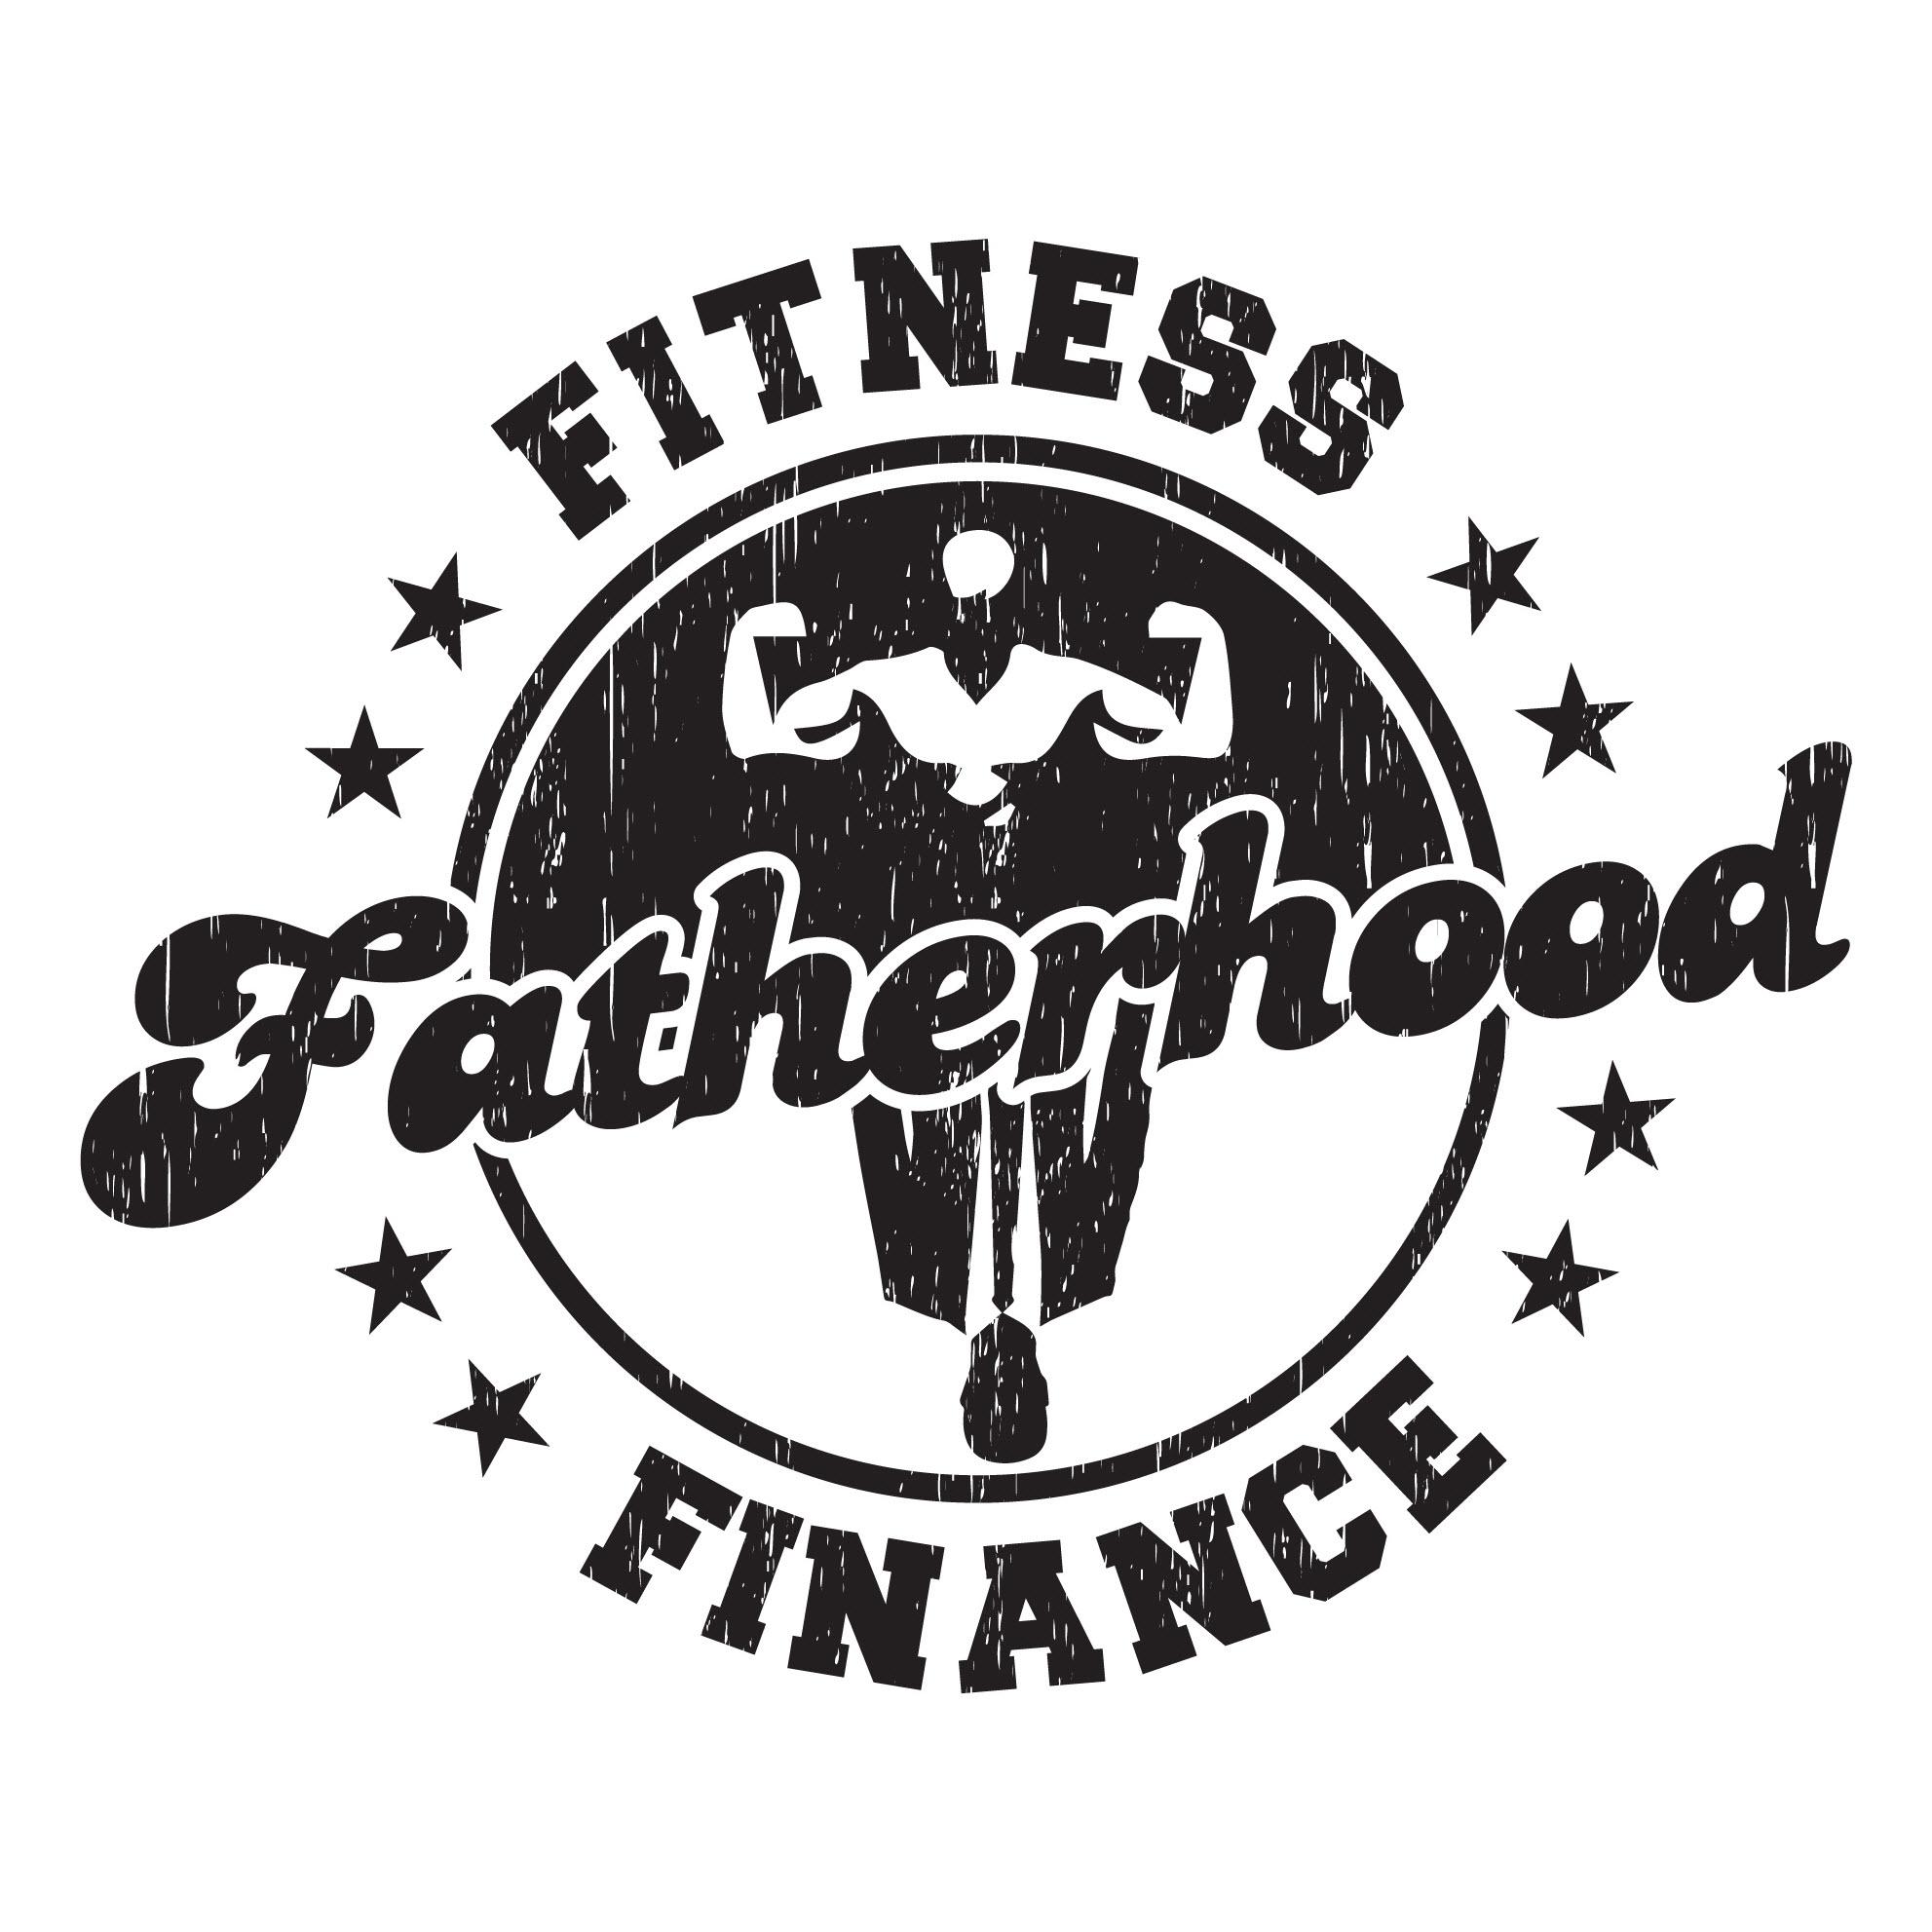 Fatherhood fitness finance podcast training resource for being fatherhood fitness finance podcast training resource for being a happy healthy and weathy dad listen via stitcher radio on demand biocorpaavc Images